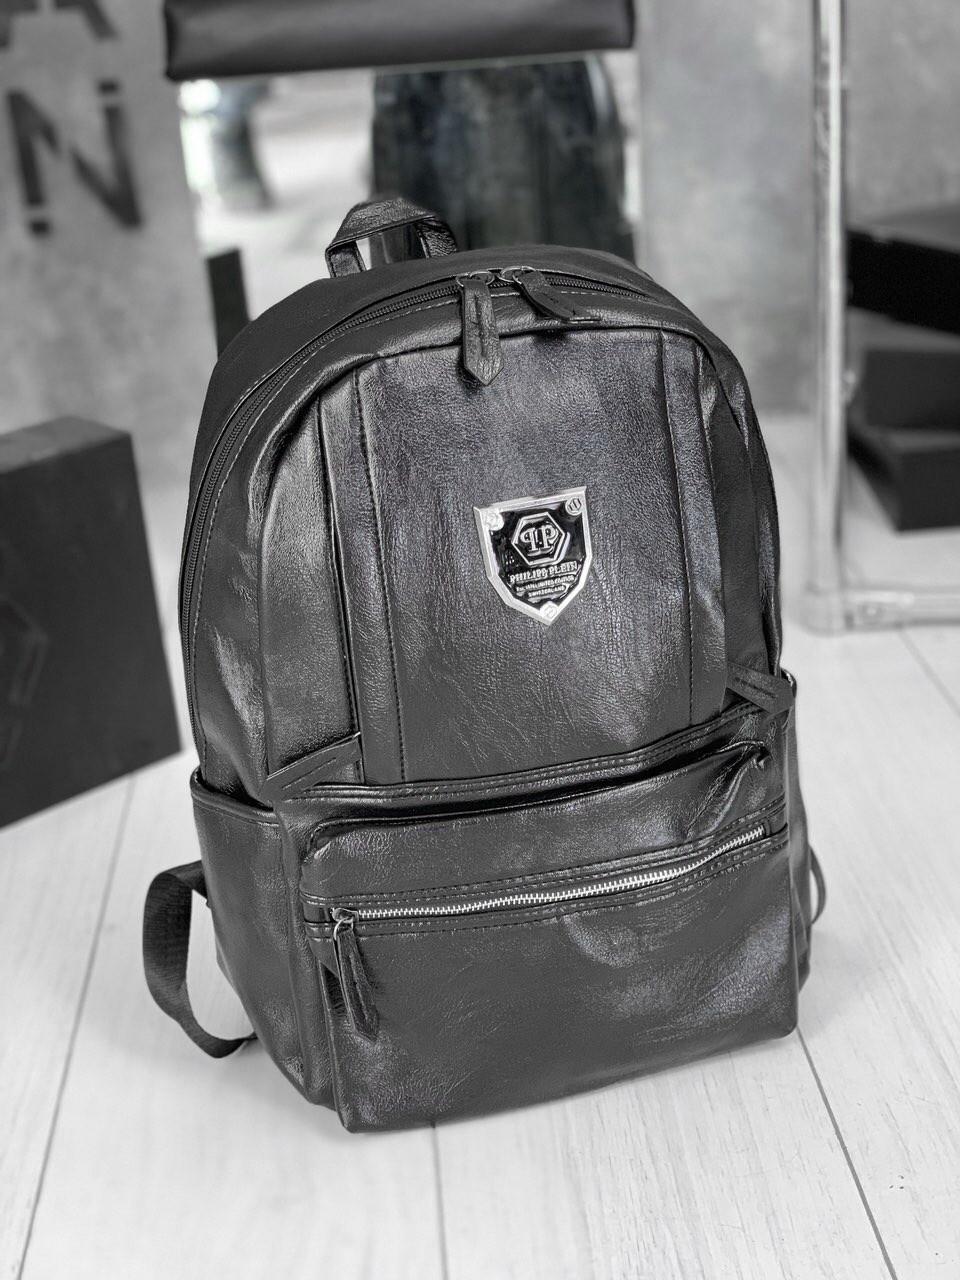 Рюкзак Philipp Plein D1551 черный